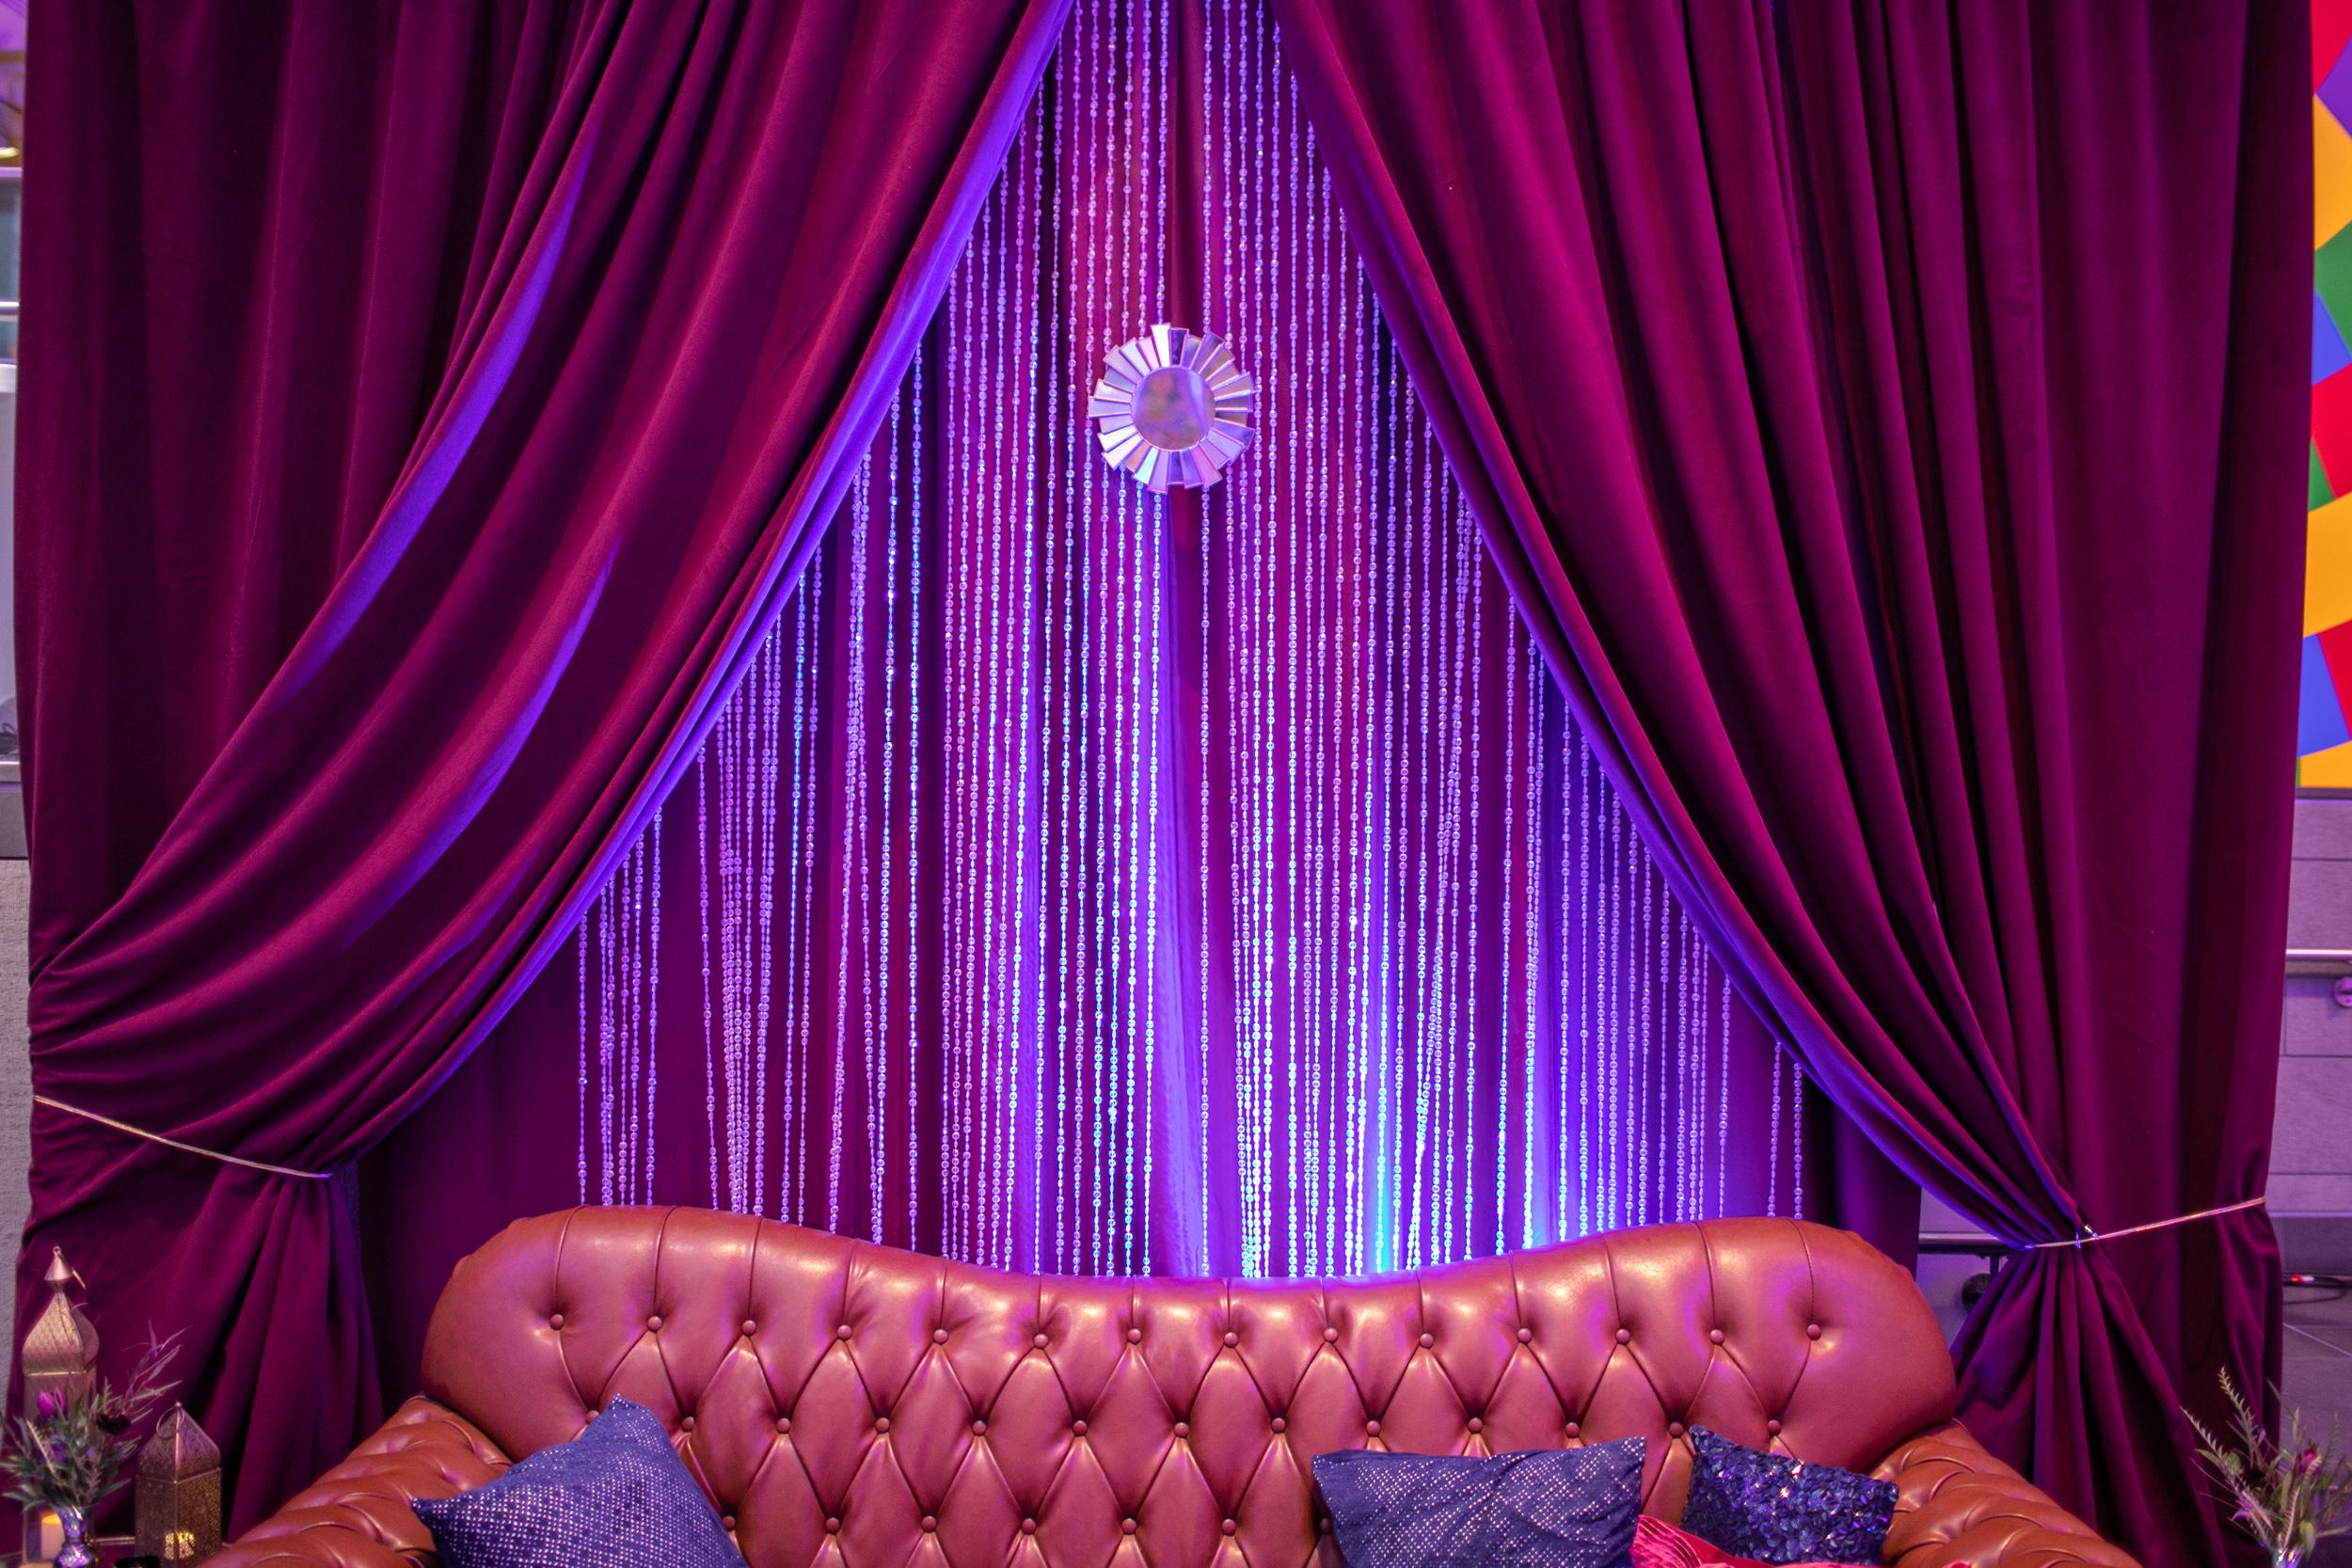 Masquerade_Ball_Currier_Museum_Manchester_Malloy_Events_lighting_drape